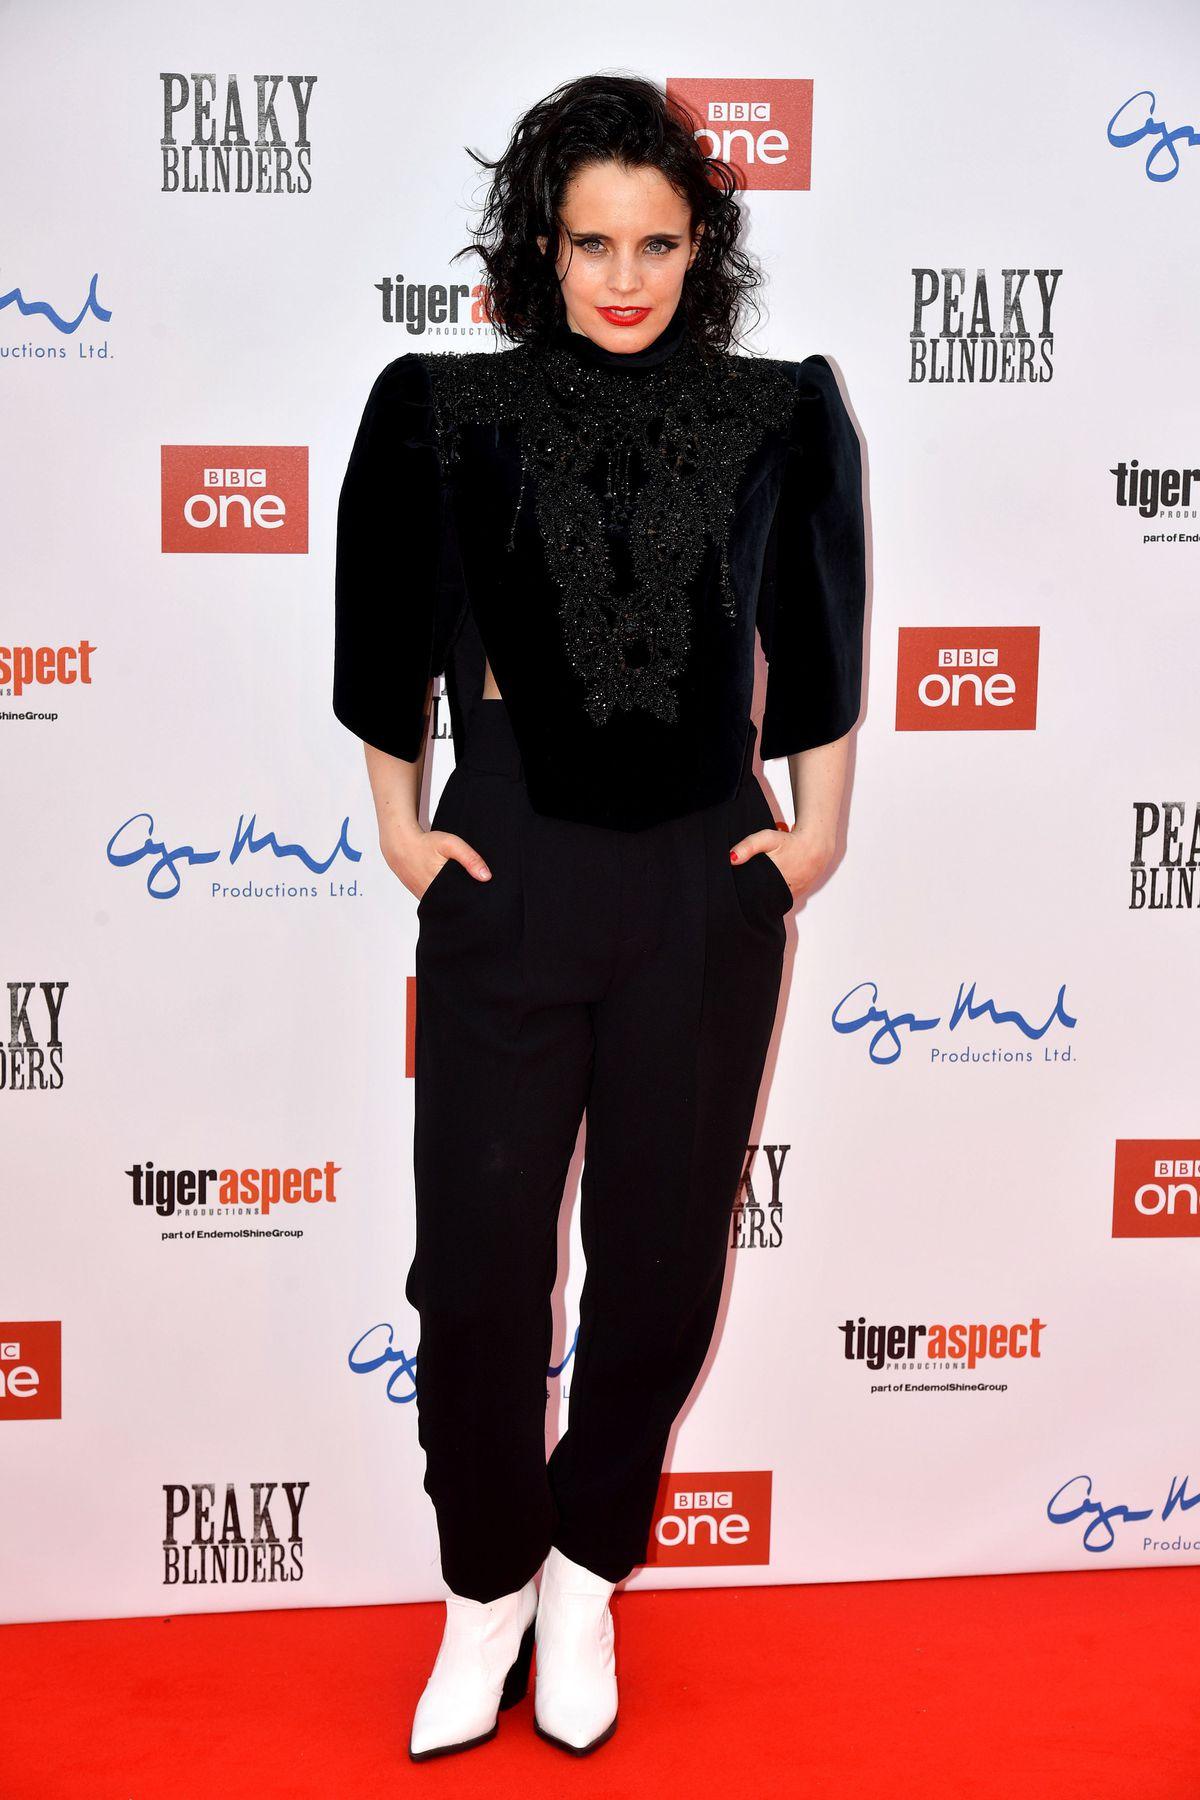 Anna Calvi attending the Peaky Blinders Series Five World Premiere held at Birmingham Town Hall